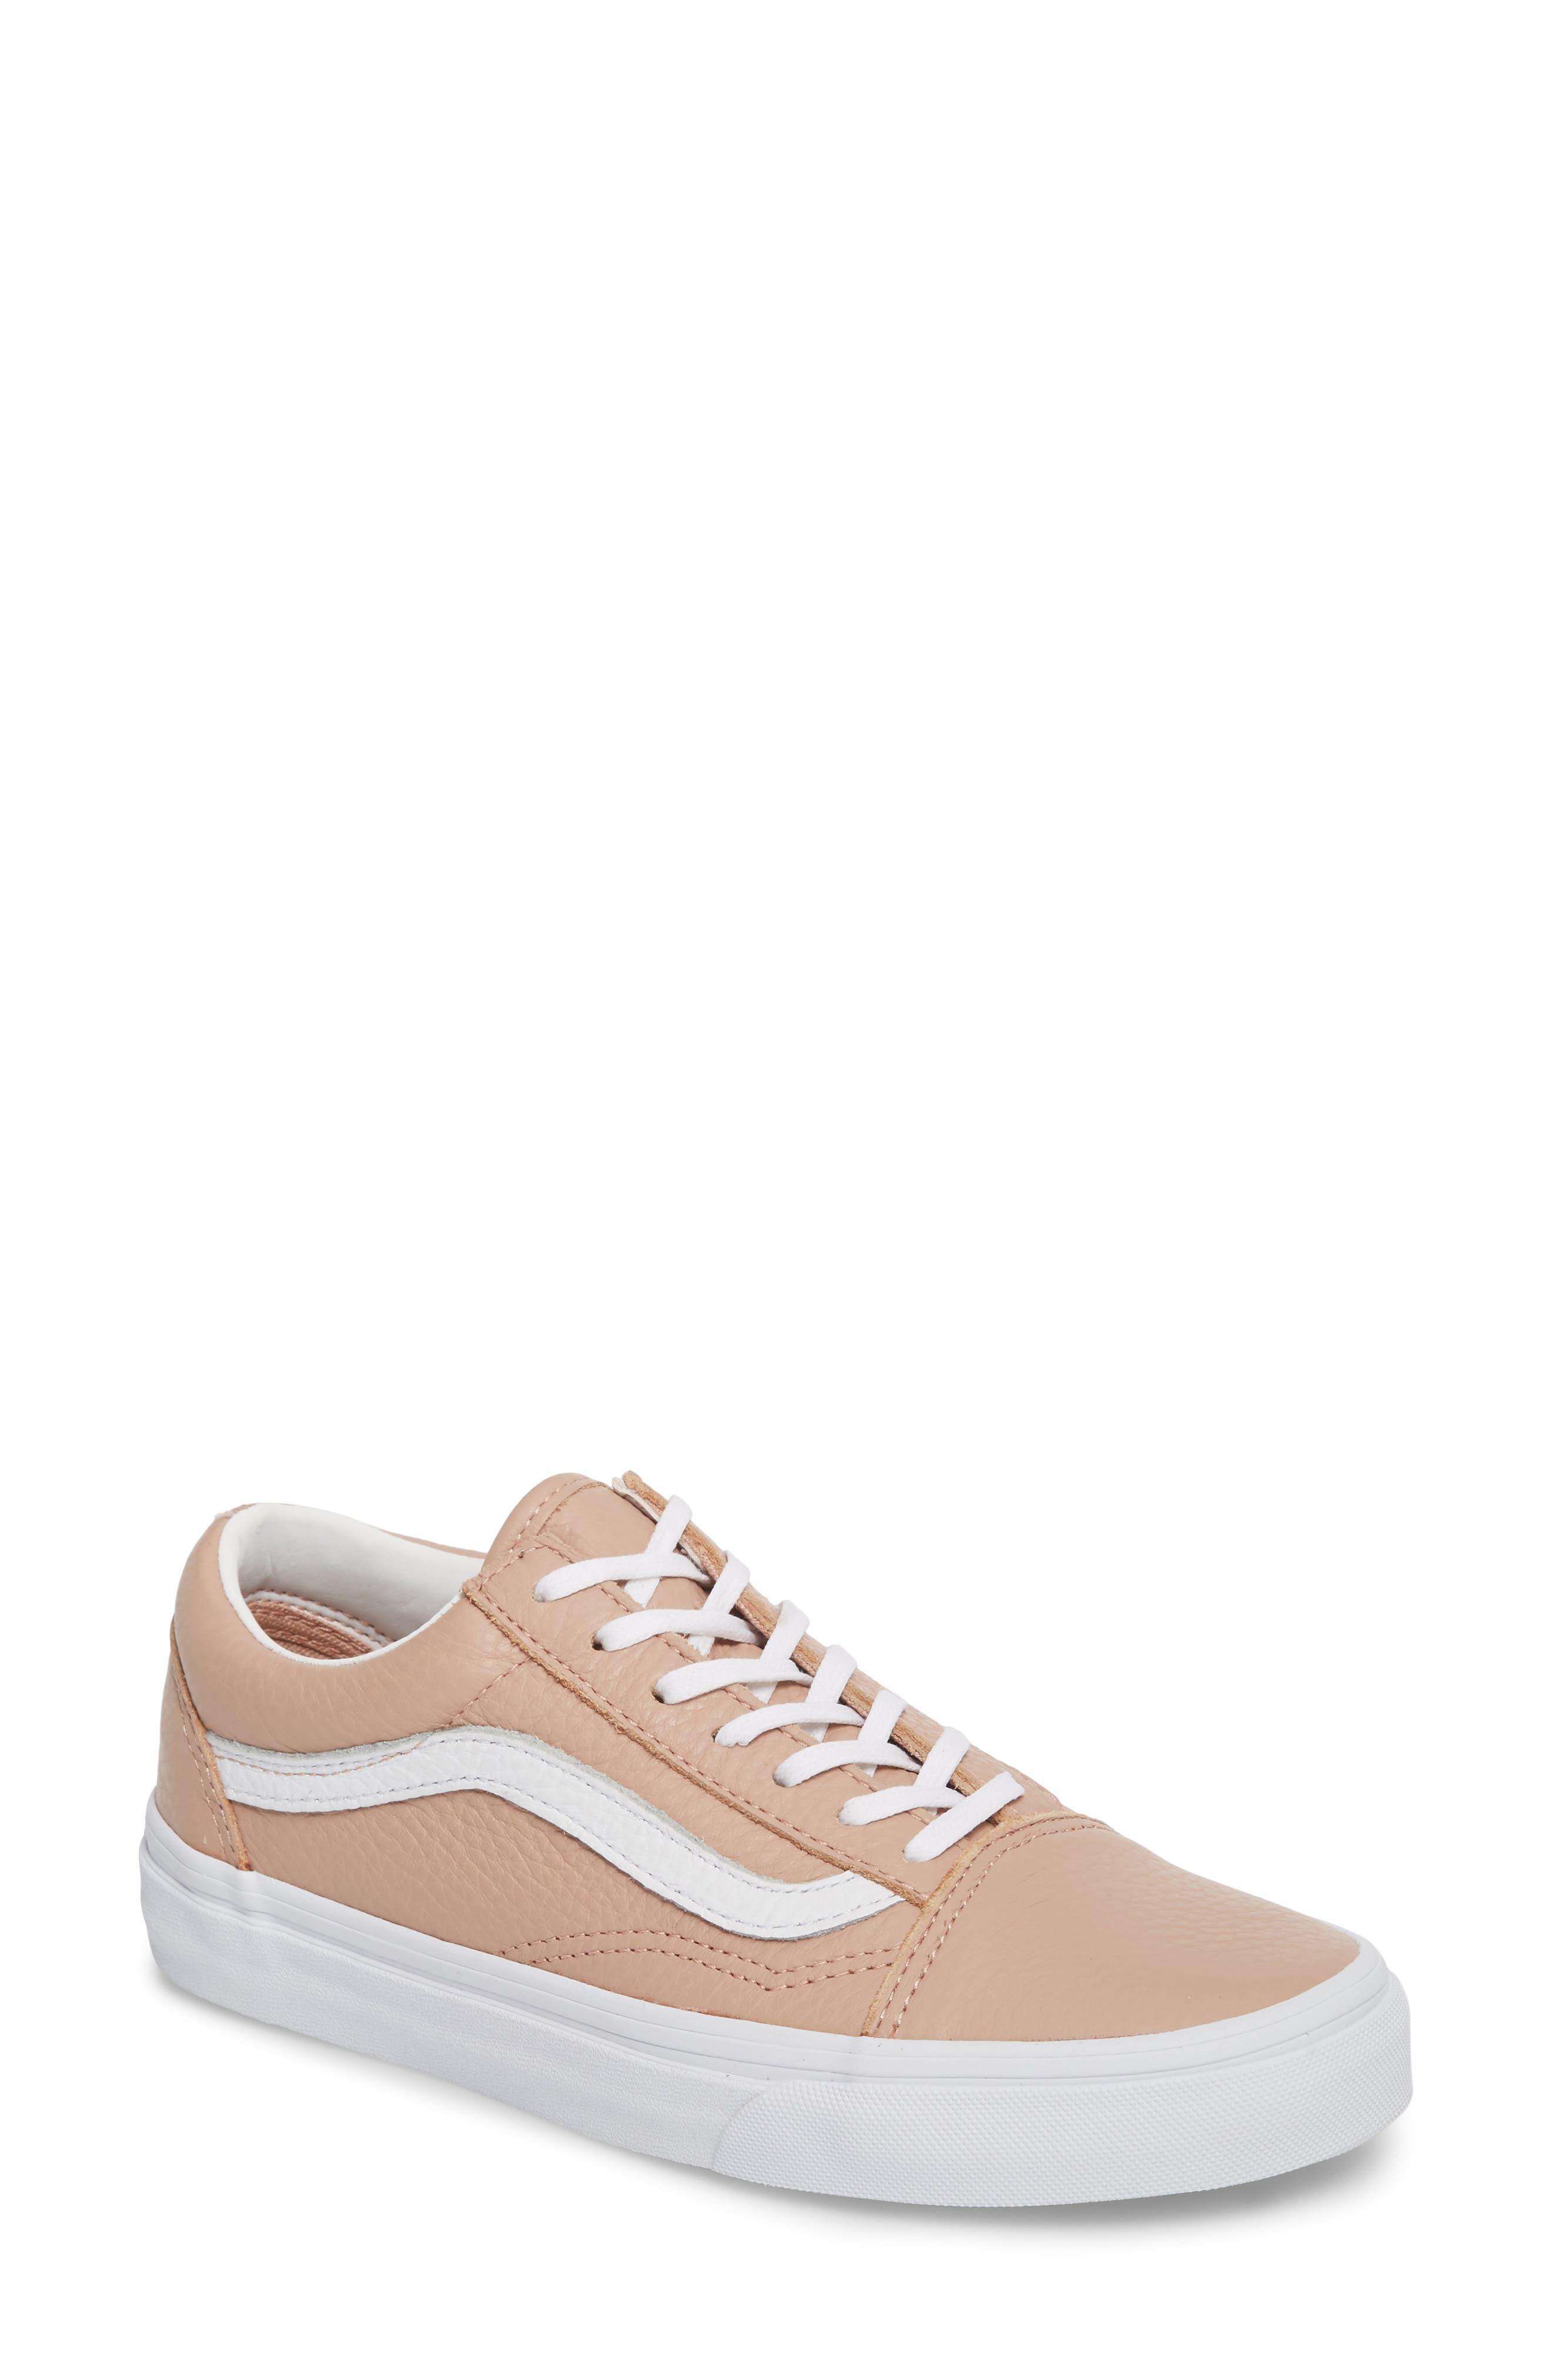 Old Skool DX Sneaker,                             Main thumbnail 1, color,                             652